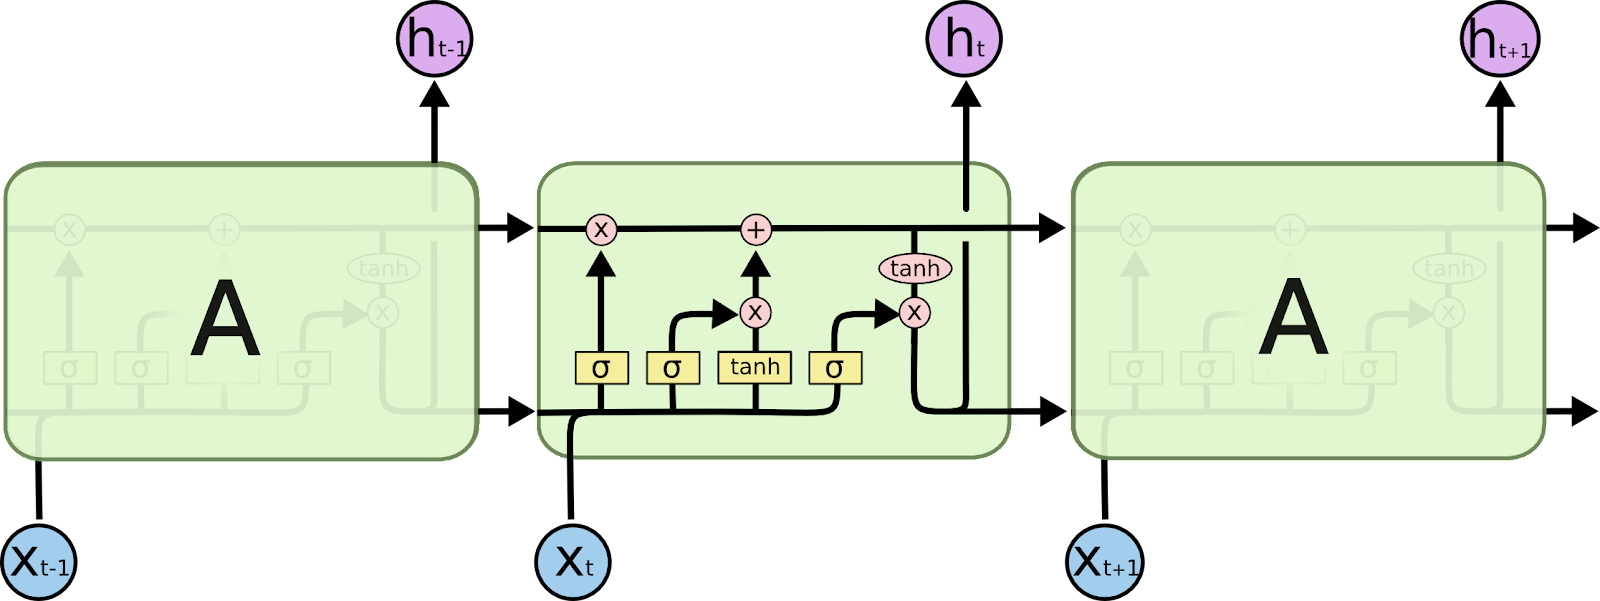 A LSTM neural network.